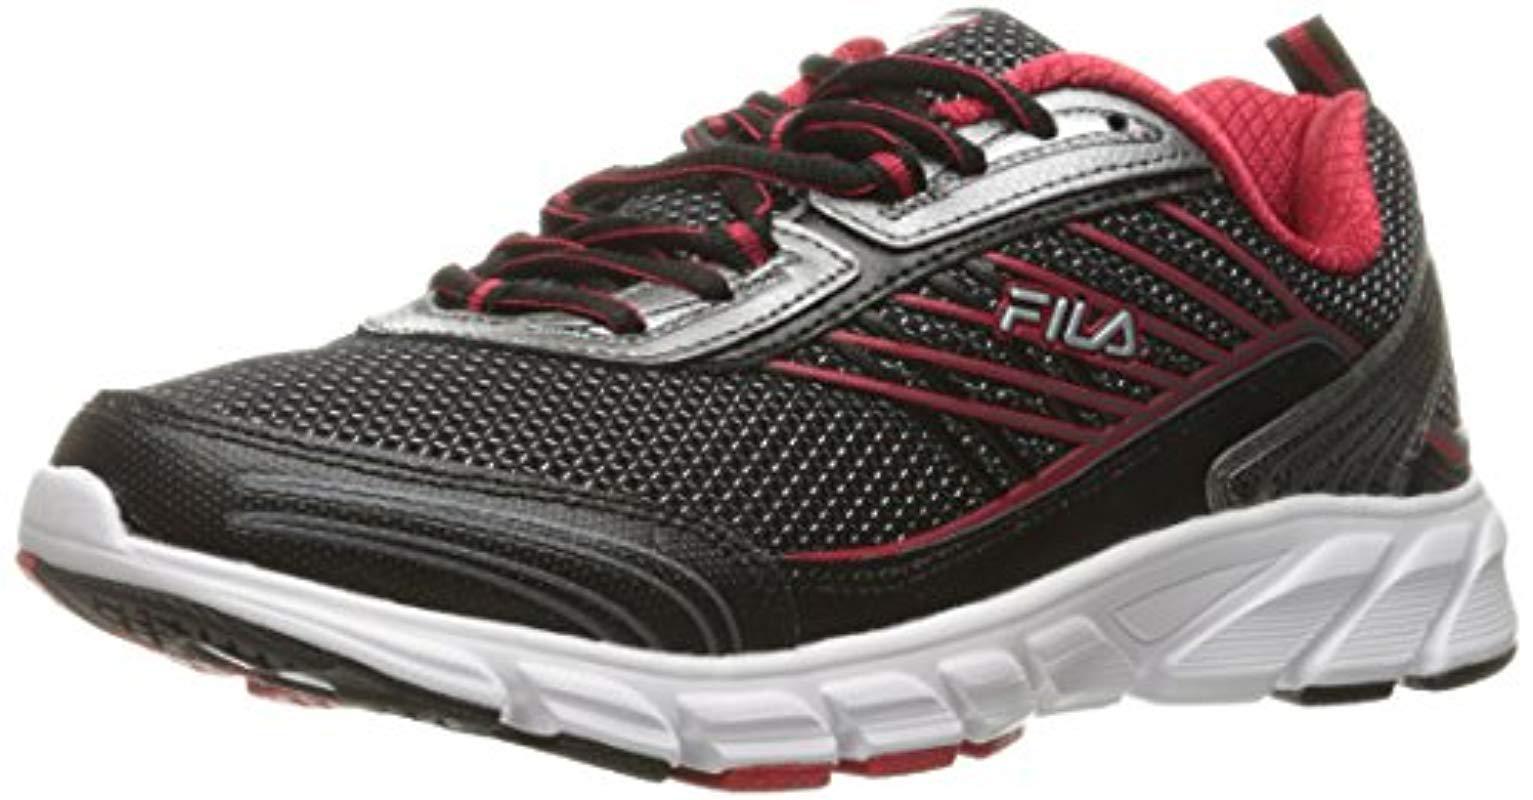 7eca1a238bc7 Lyst - Fila Forward 3 Running Shoe for Men - Save 41%